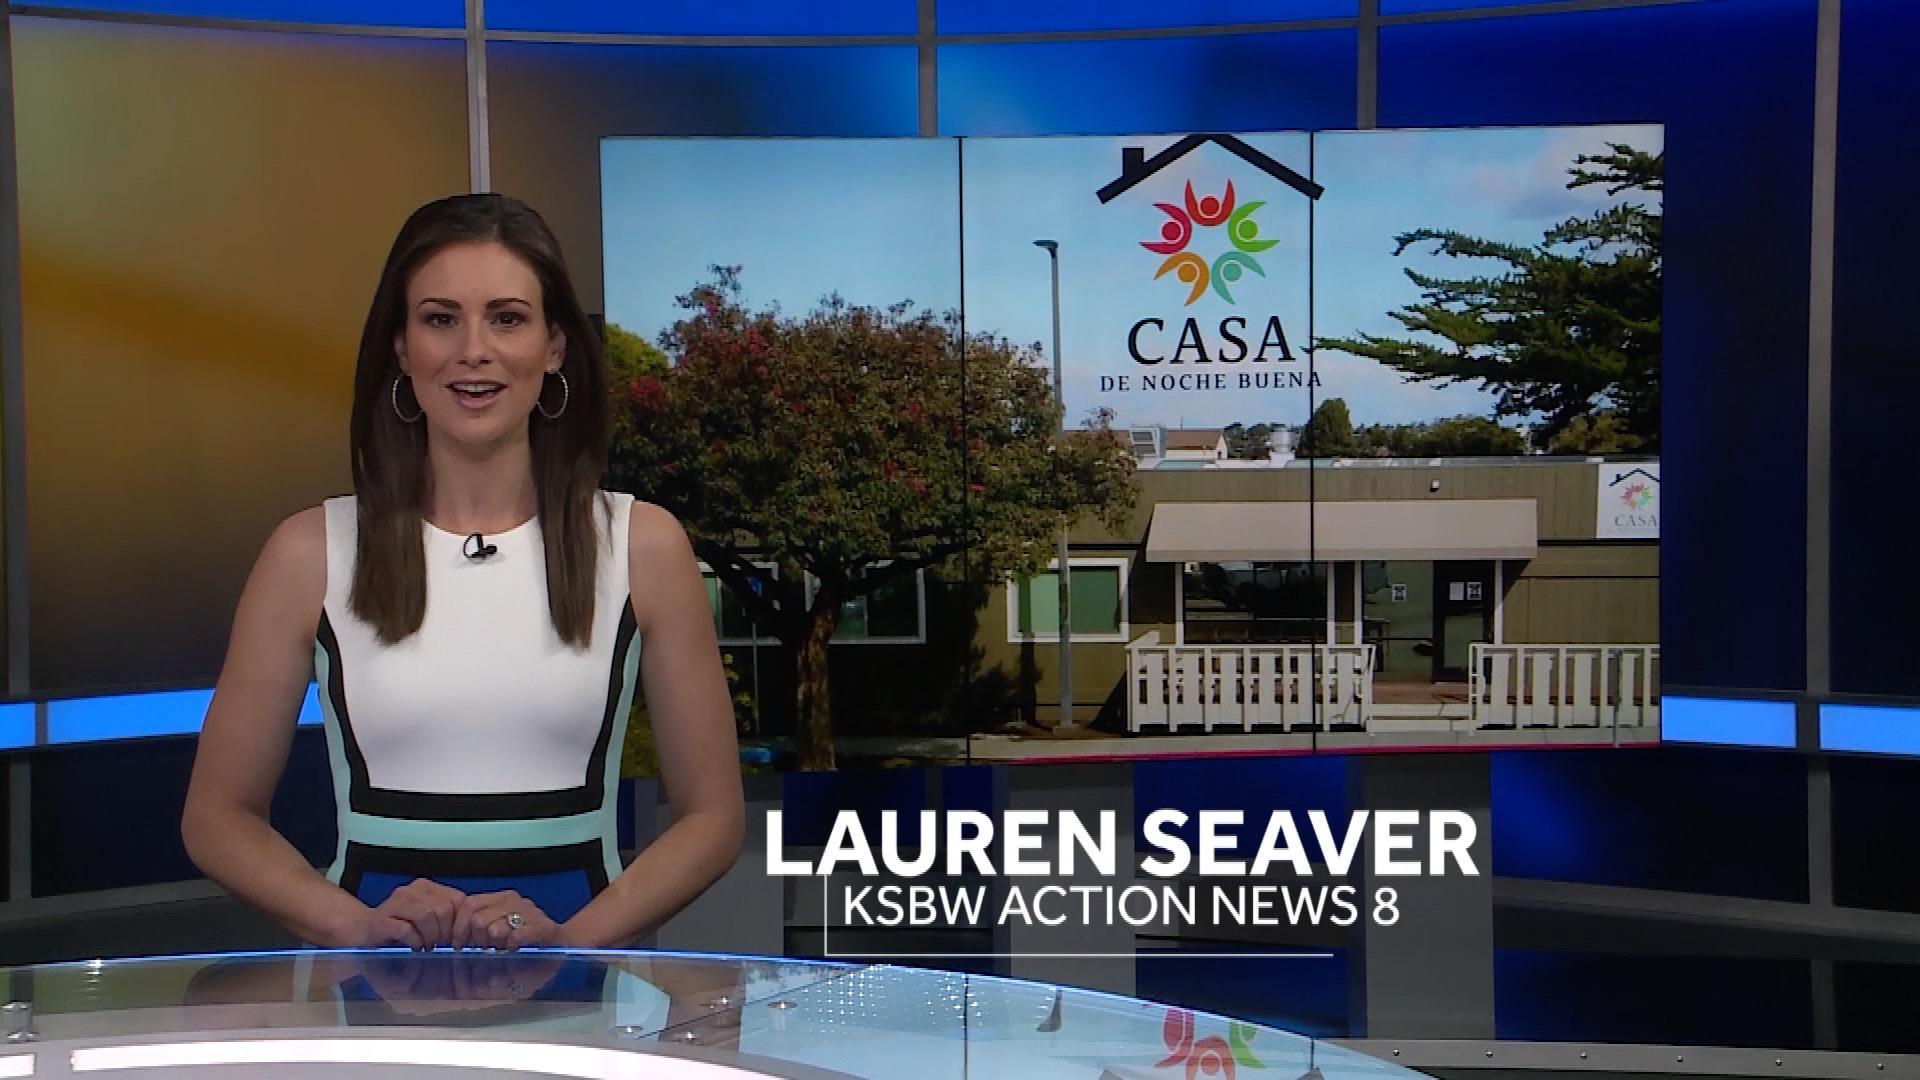 Grand Opening of Casa de Noche Buena Women's Shelter